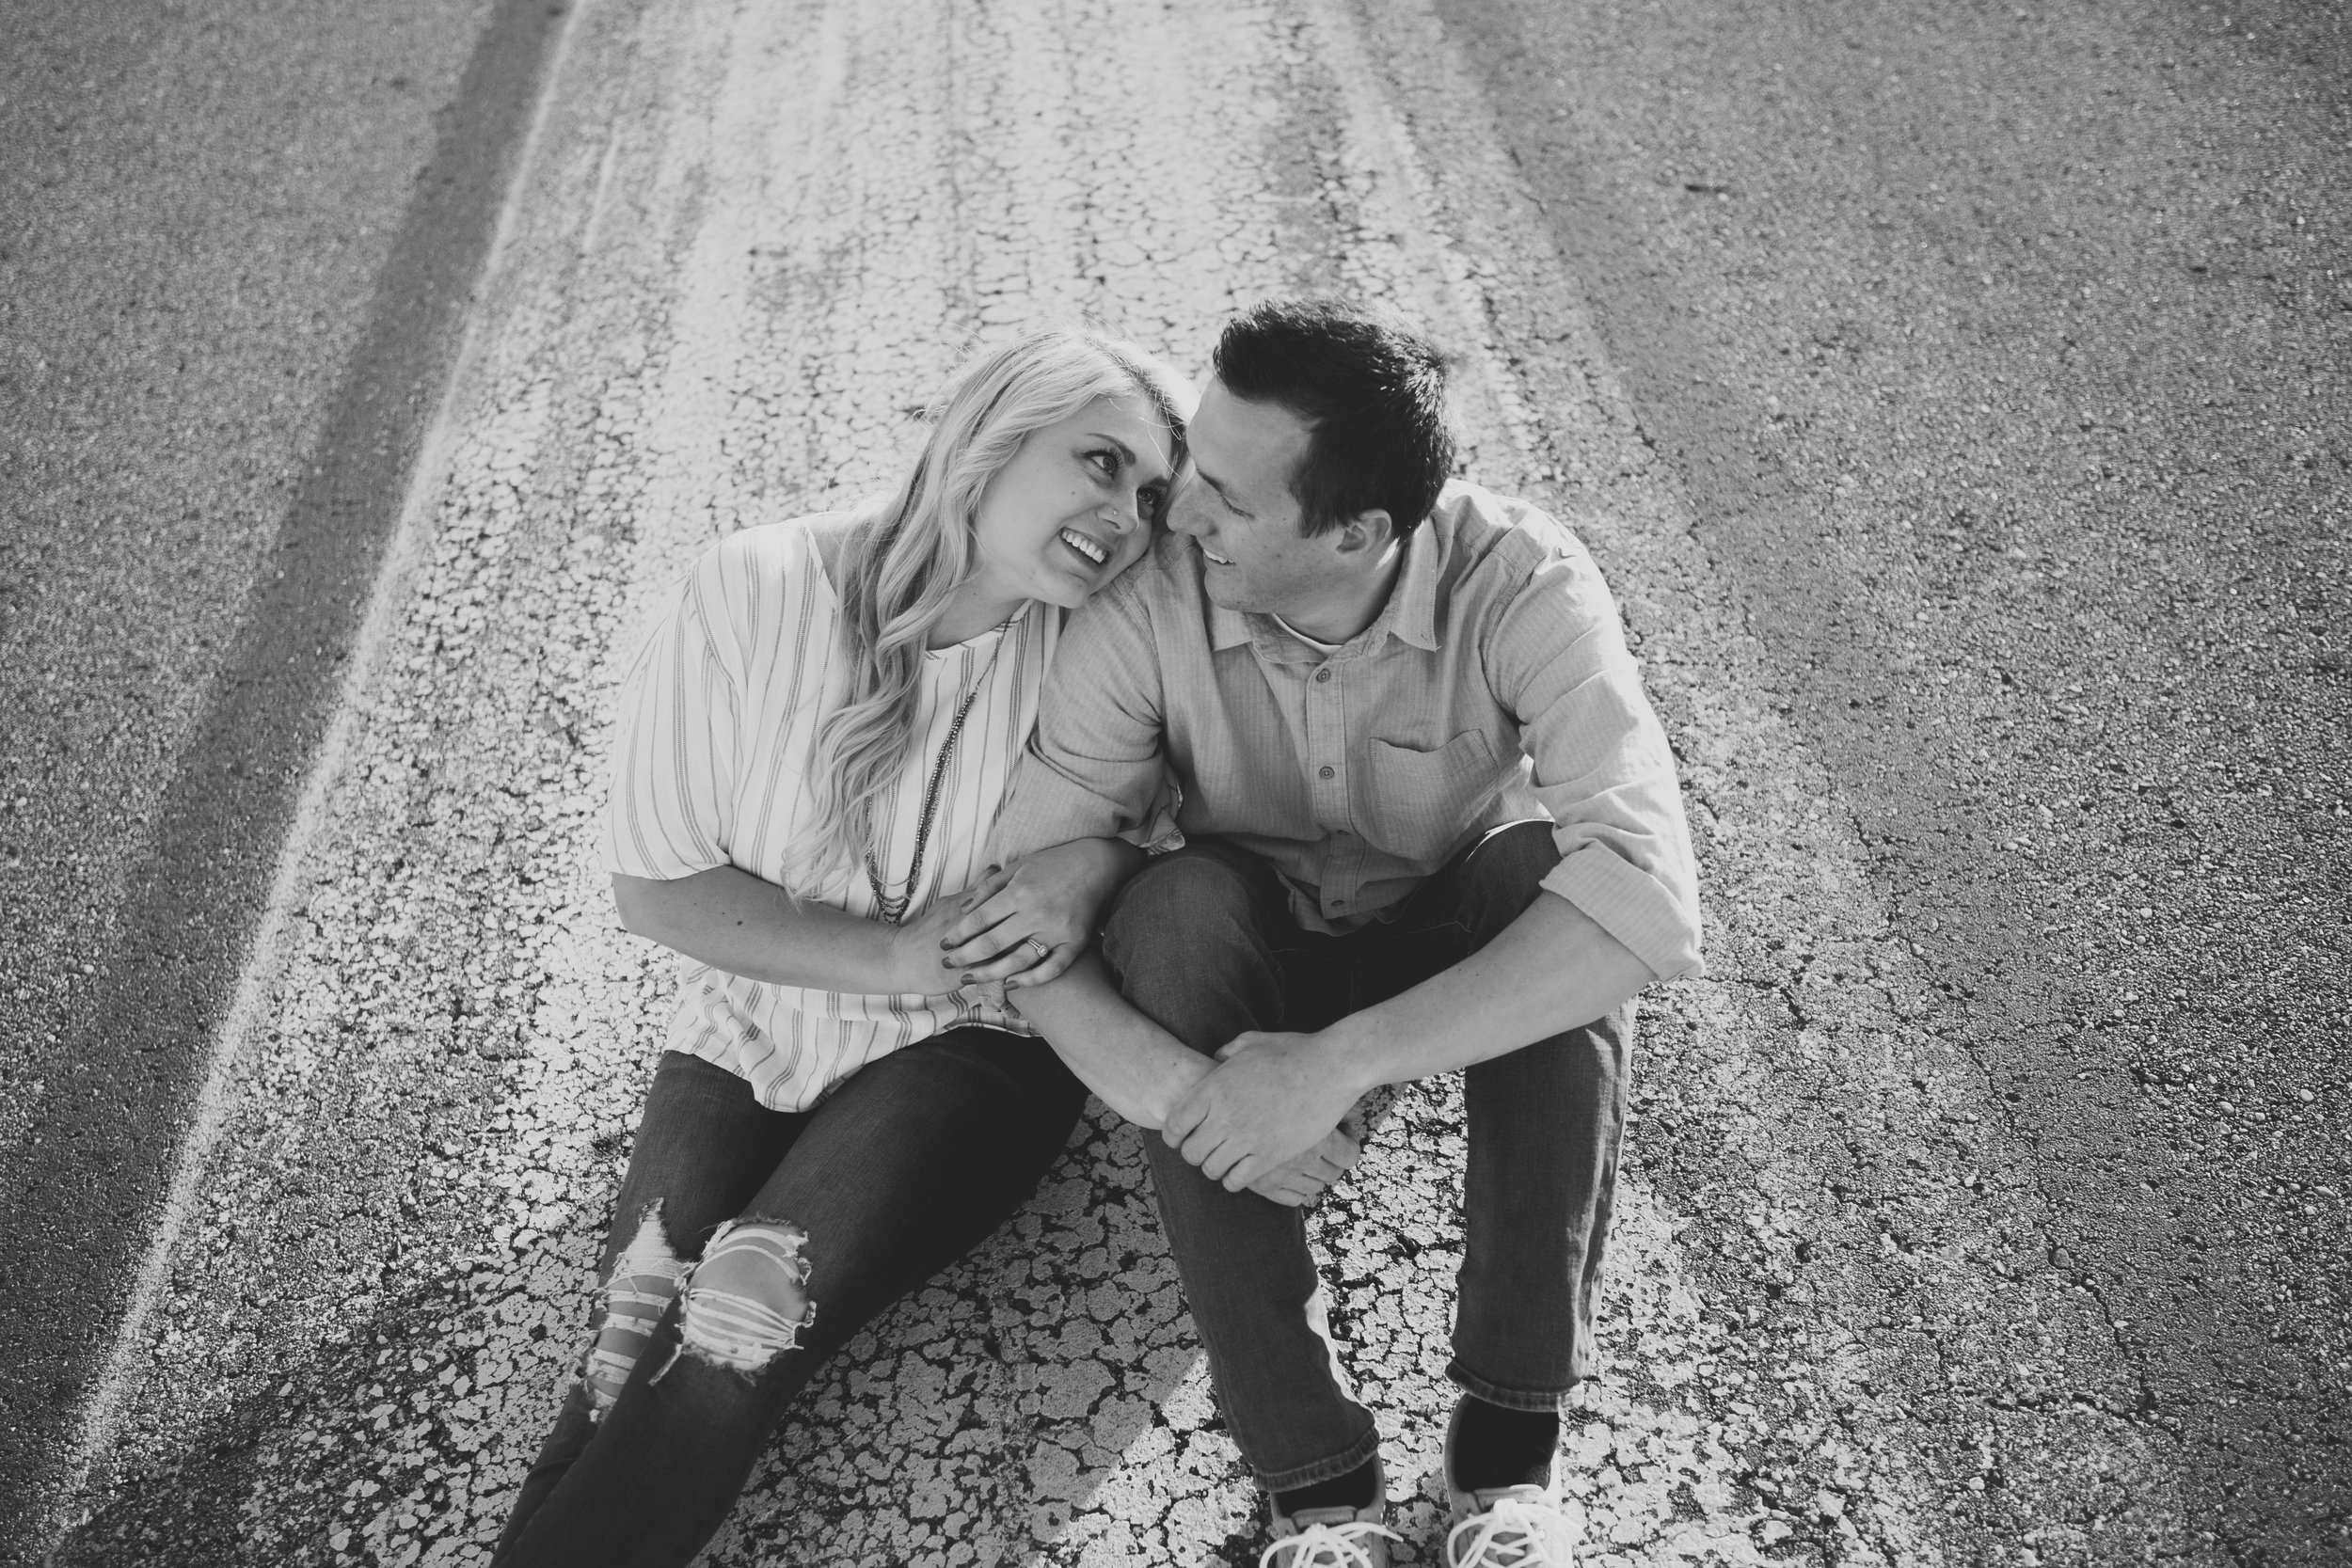 Grand Rapids Photographer - J Darling Photo - jessica darling - grand rapids wedding photographer - sparta airport - sparta michigan - jasmine and jeff engaged 043.jpg